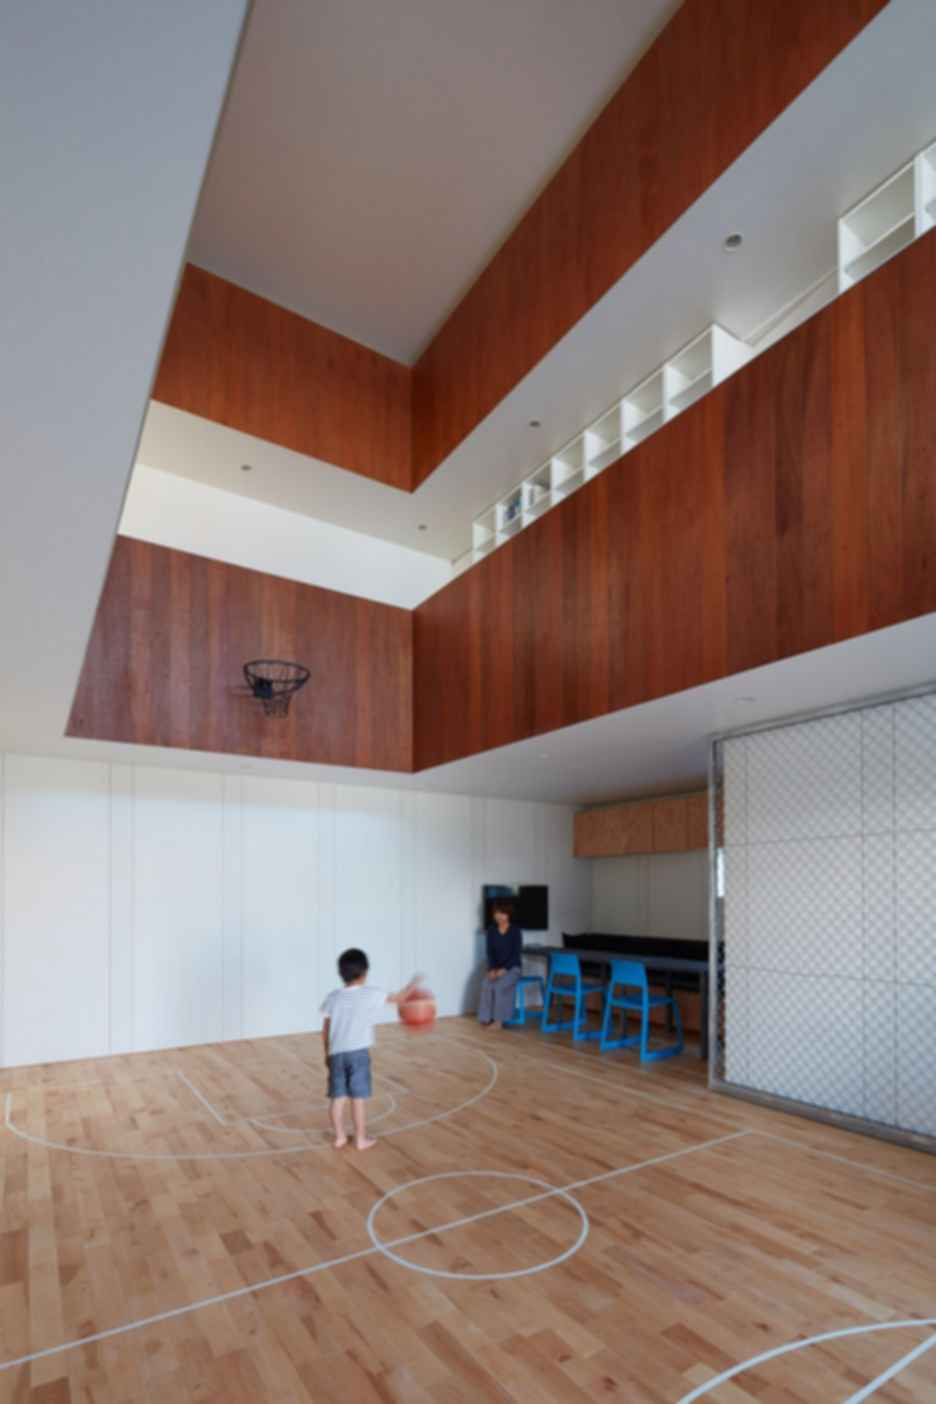 Indoor Basketball Court - Interior/Basketball Court